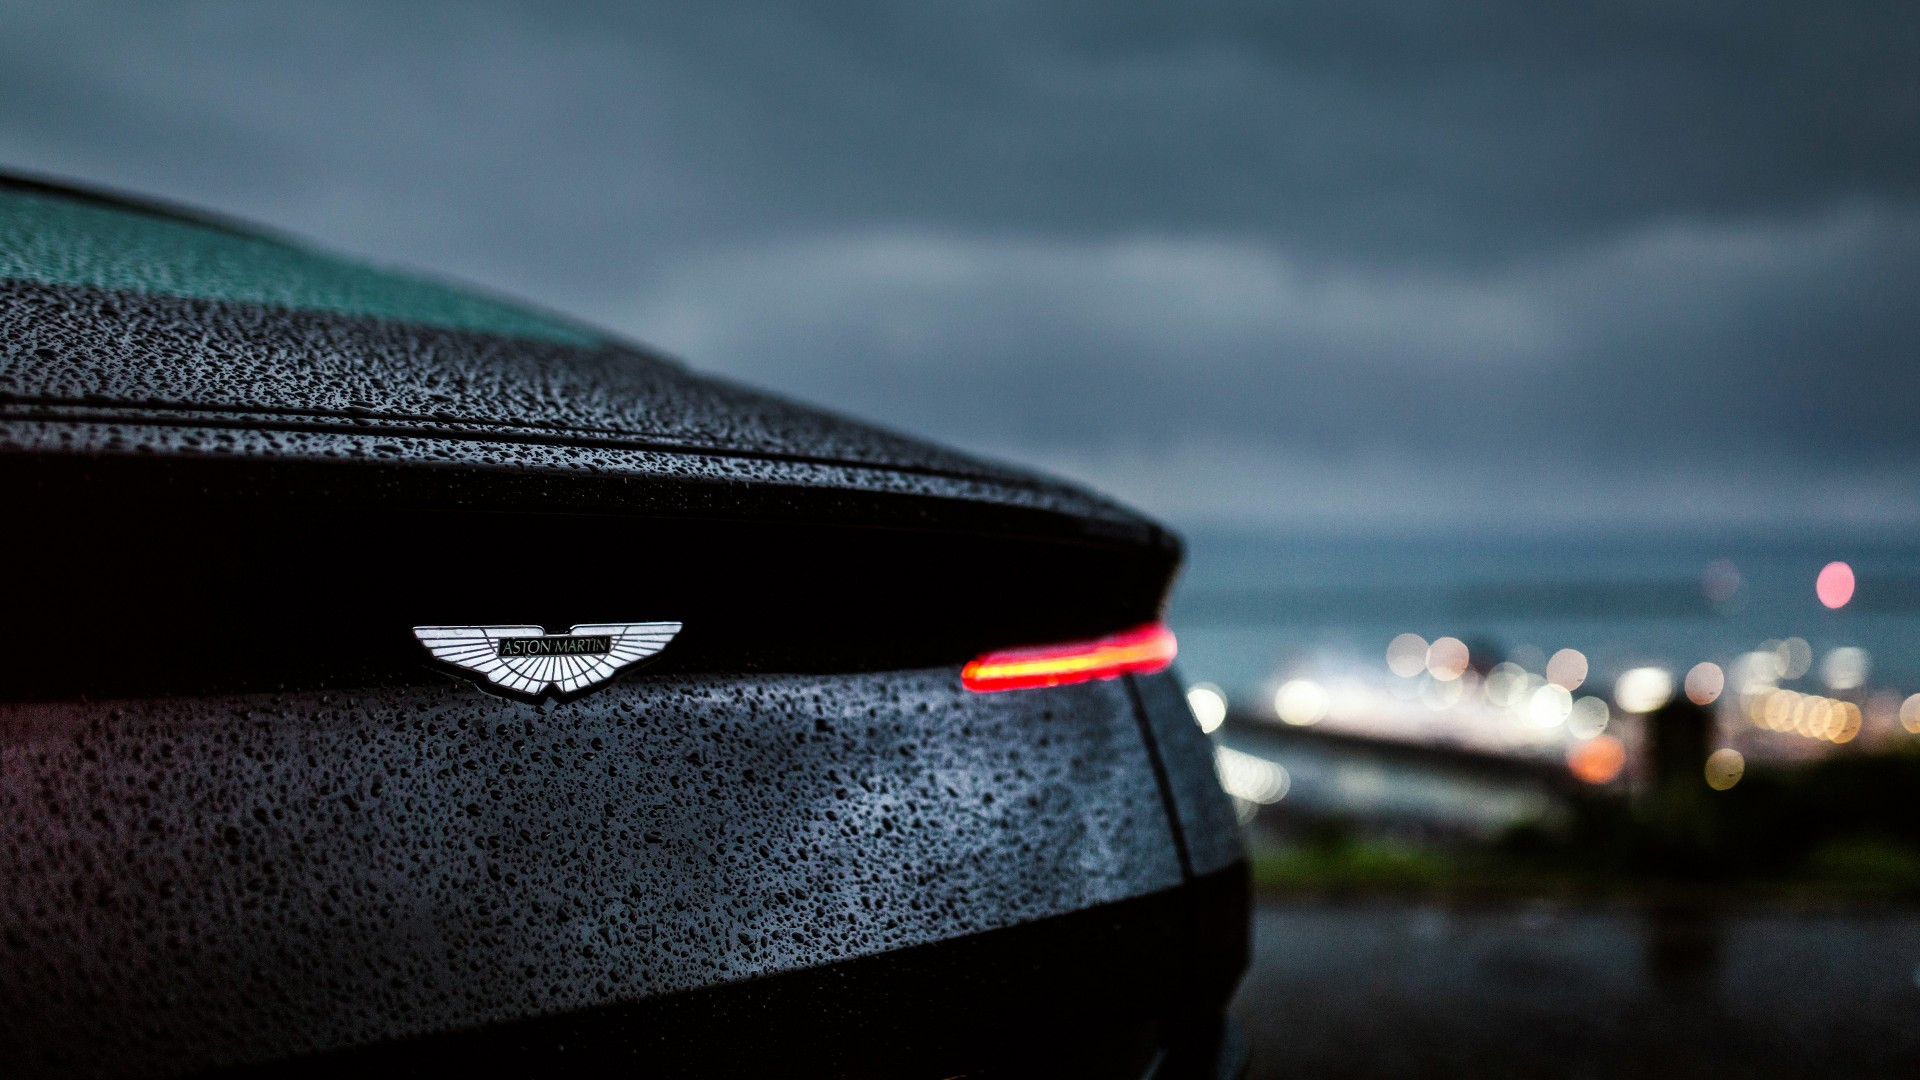 Aston Martin DB11 2017 4K Wallpaper | HD Car Wallpapers ...